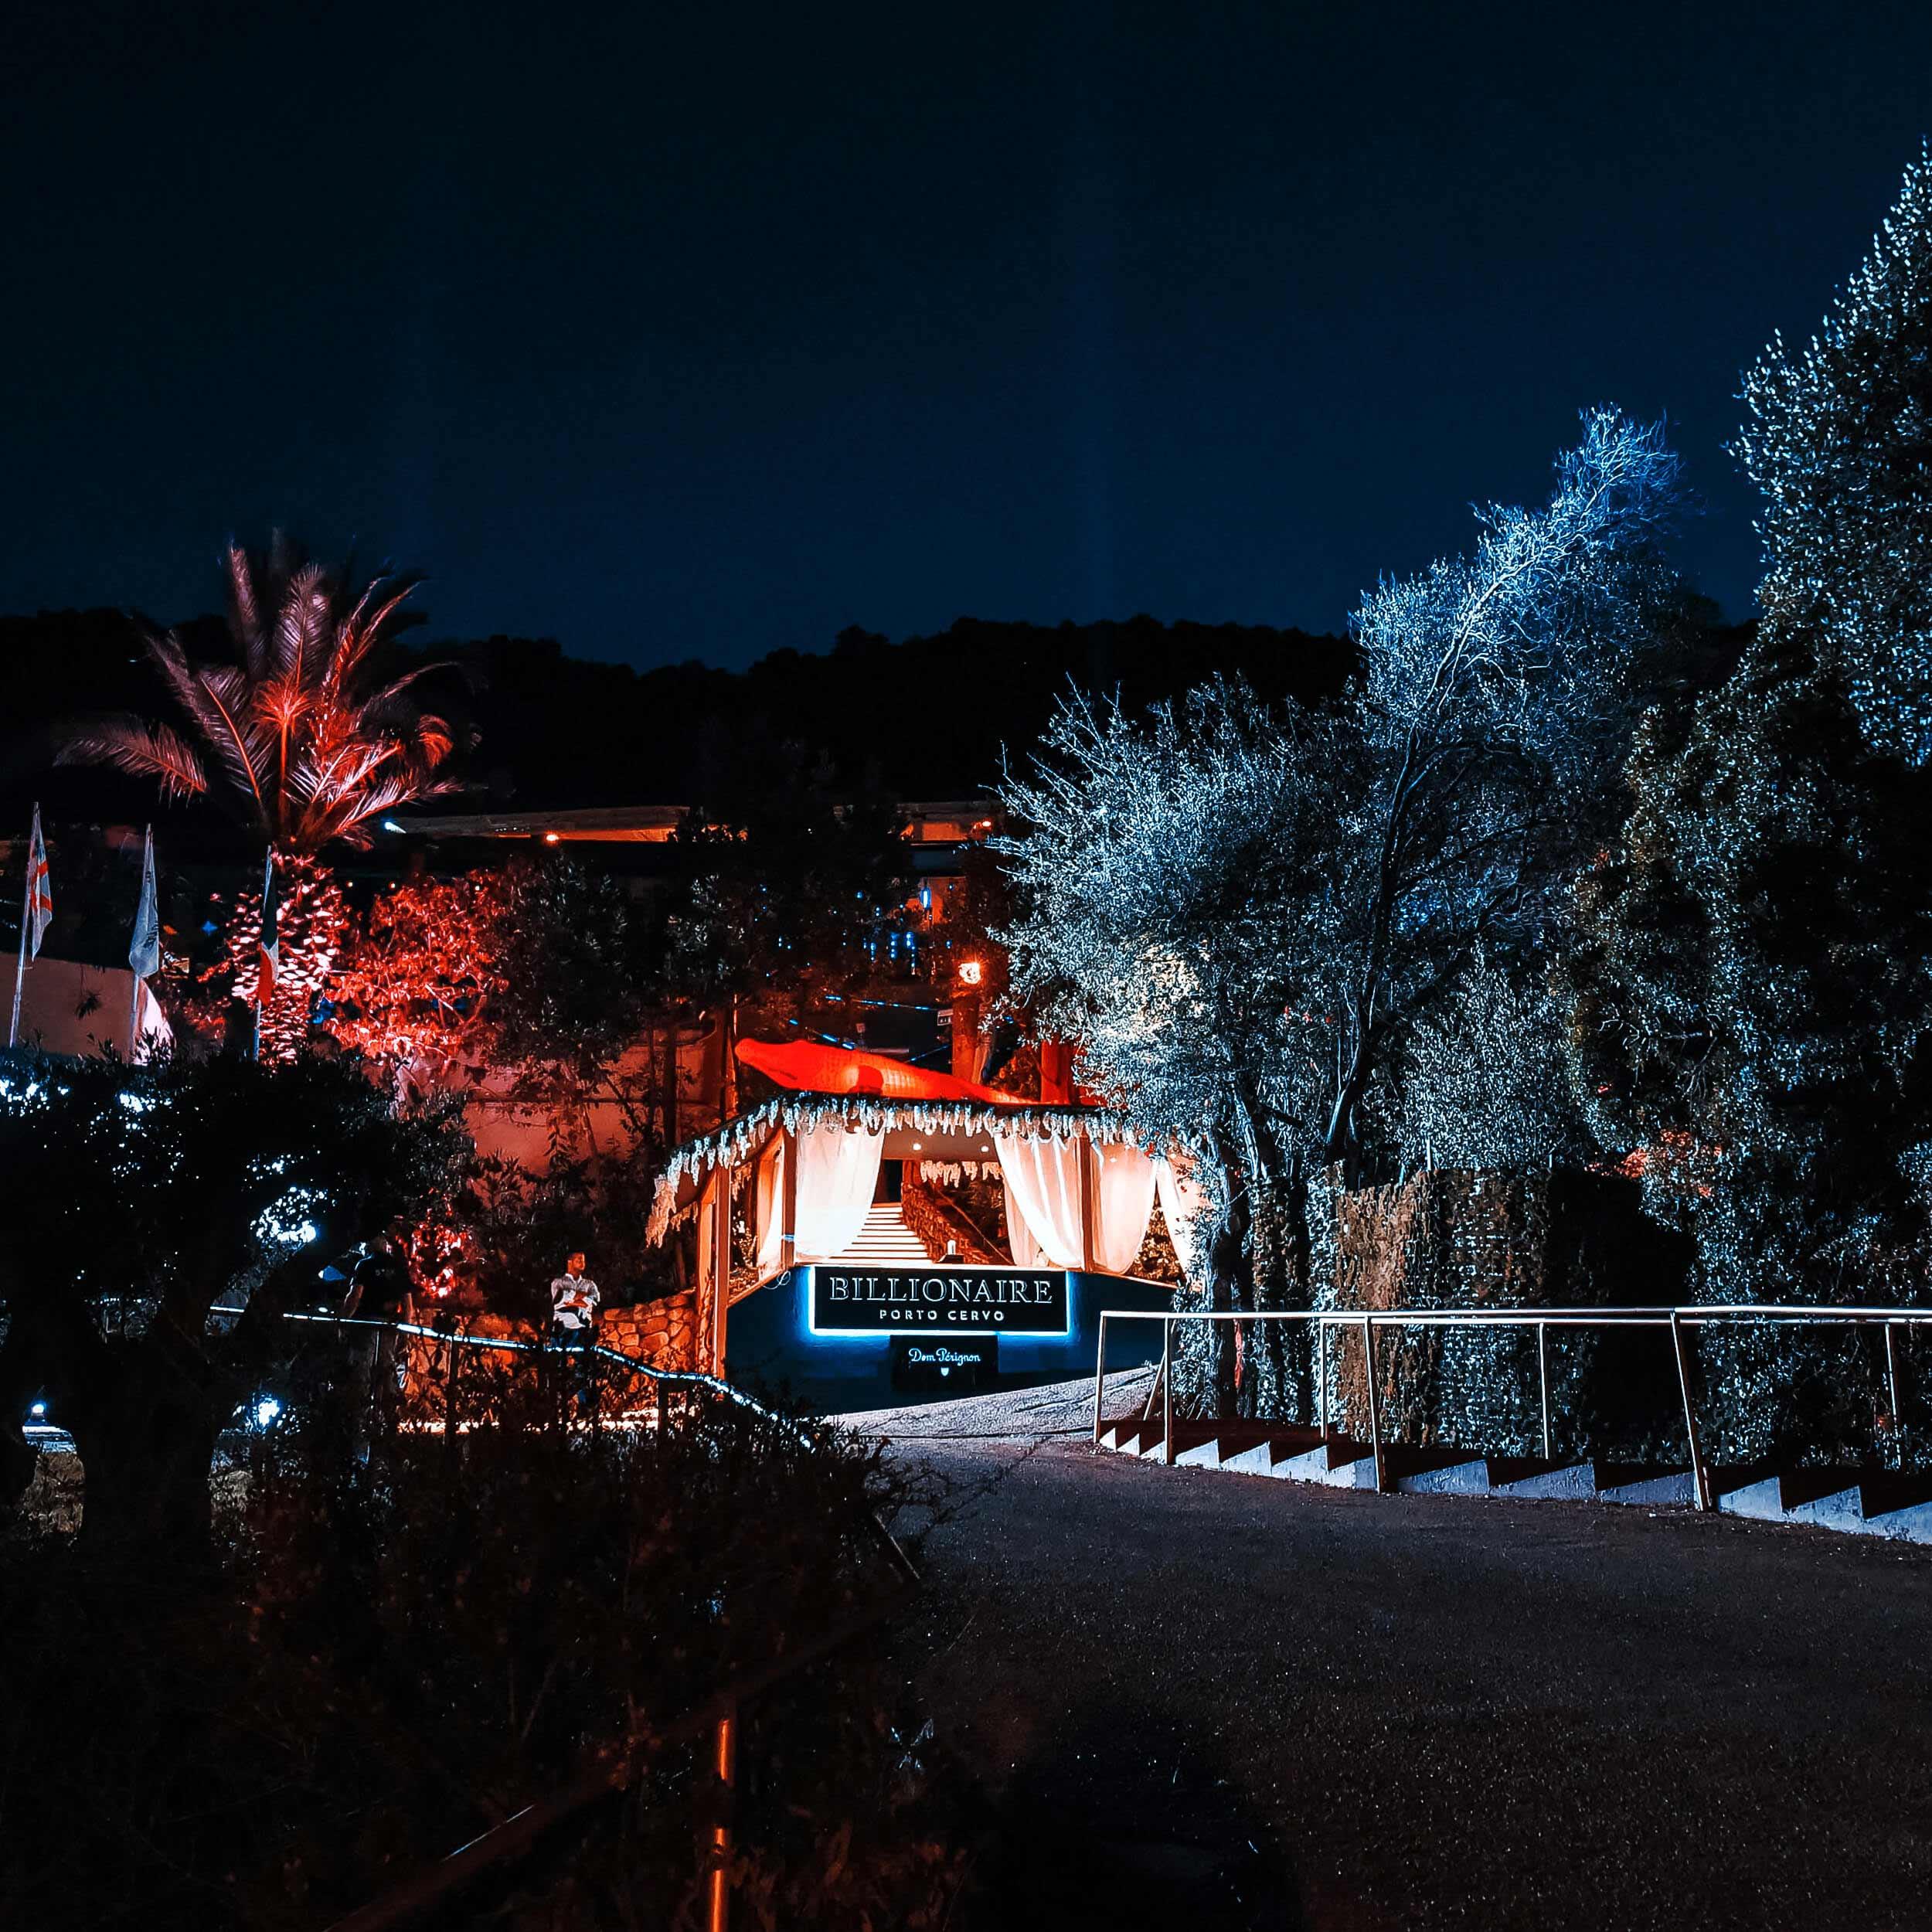 Entrance to Billionaire Porto Cervo